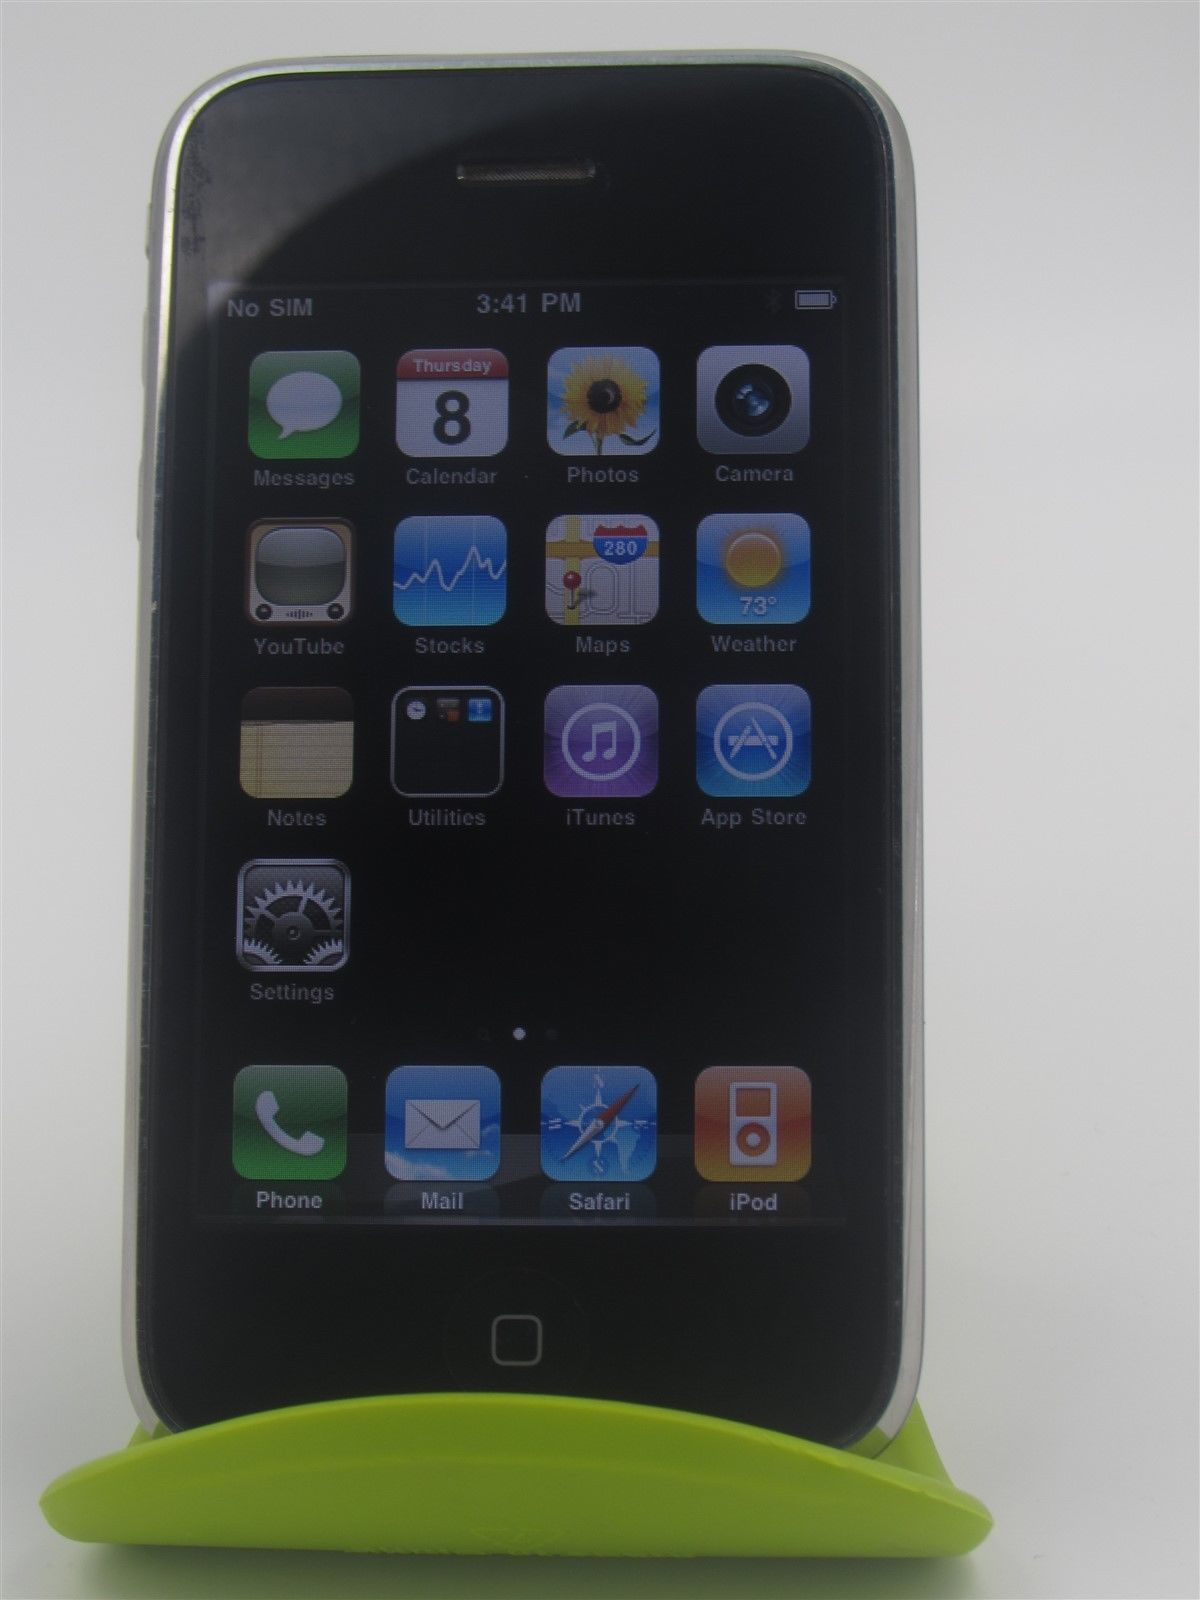 Apple iphone 3g a1241 unlocked smartphone black good